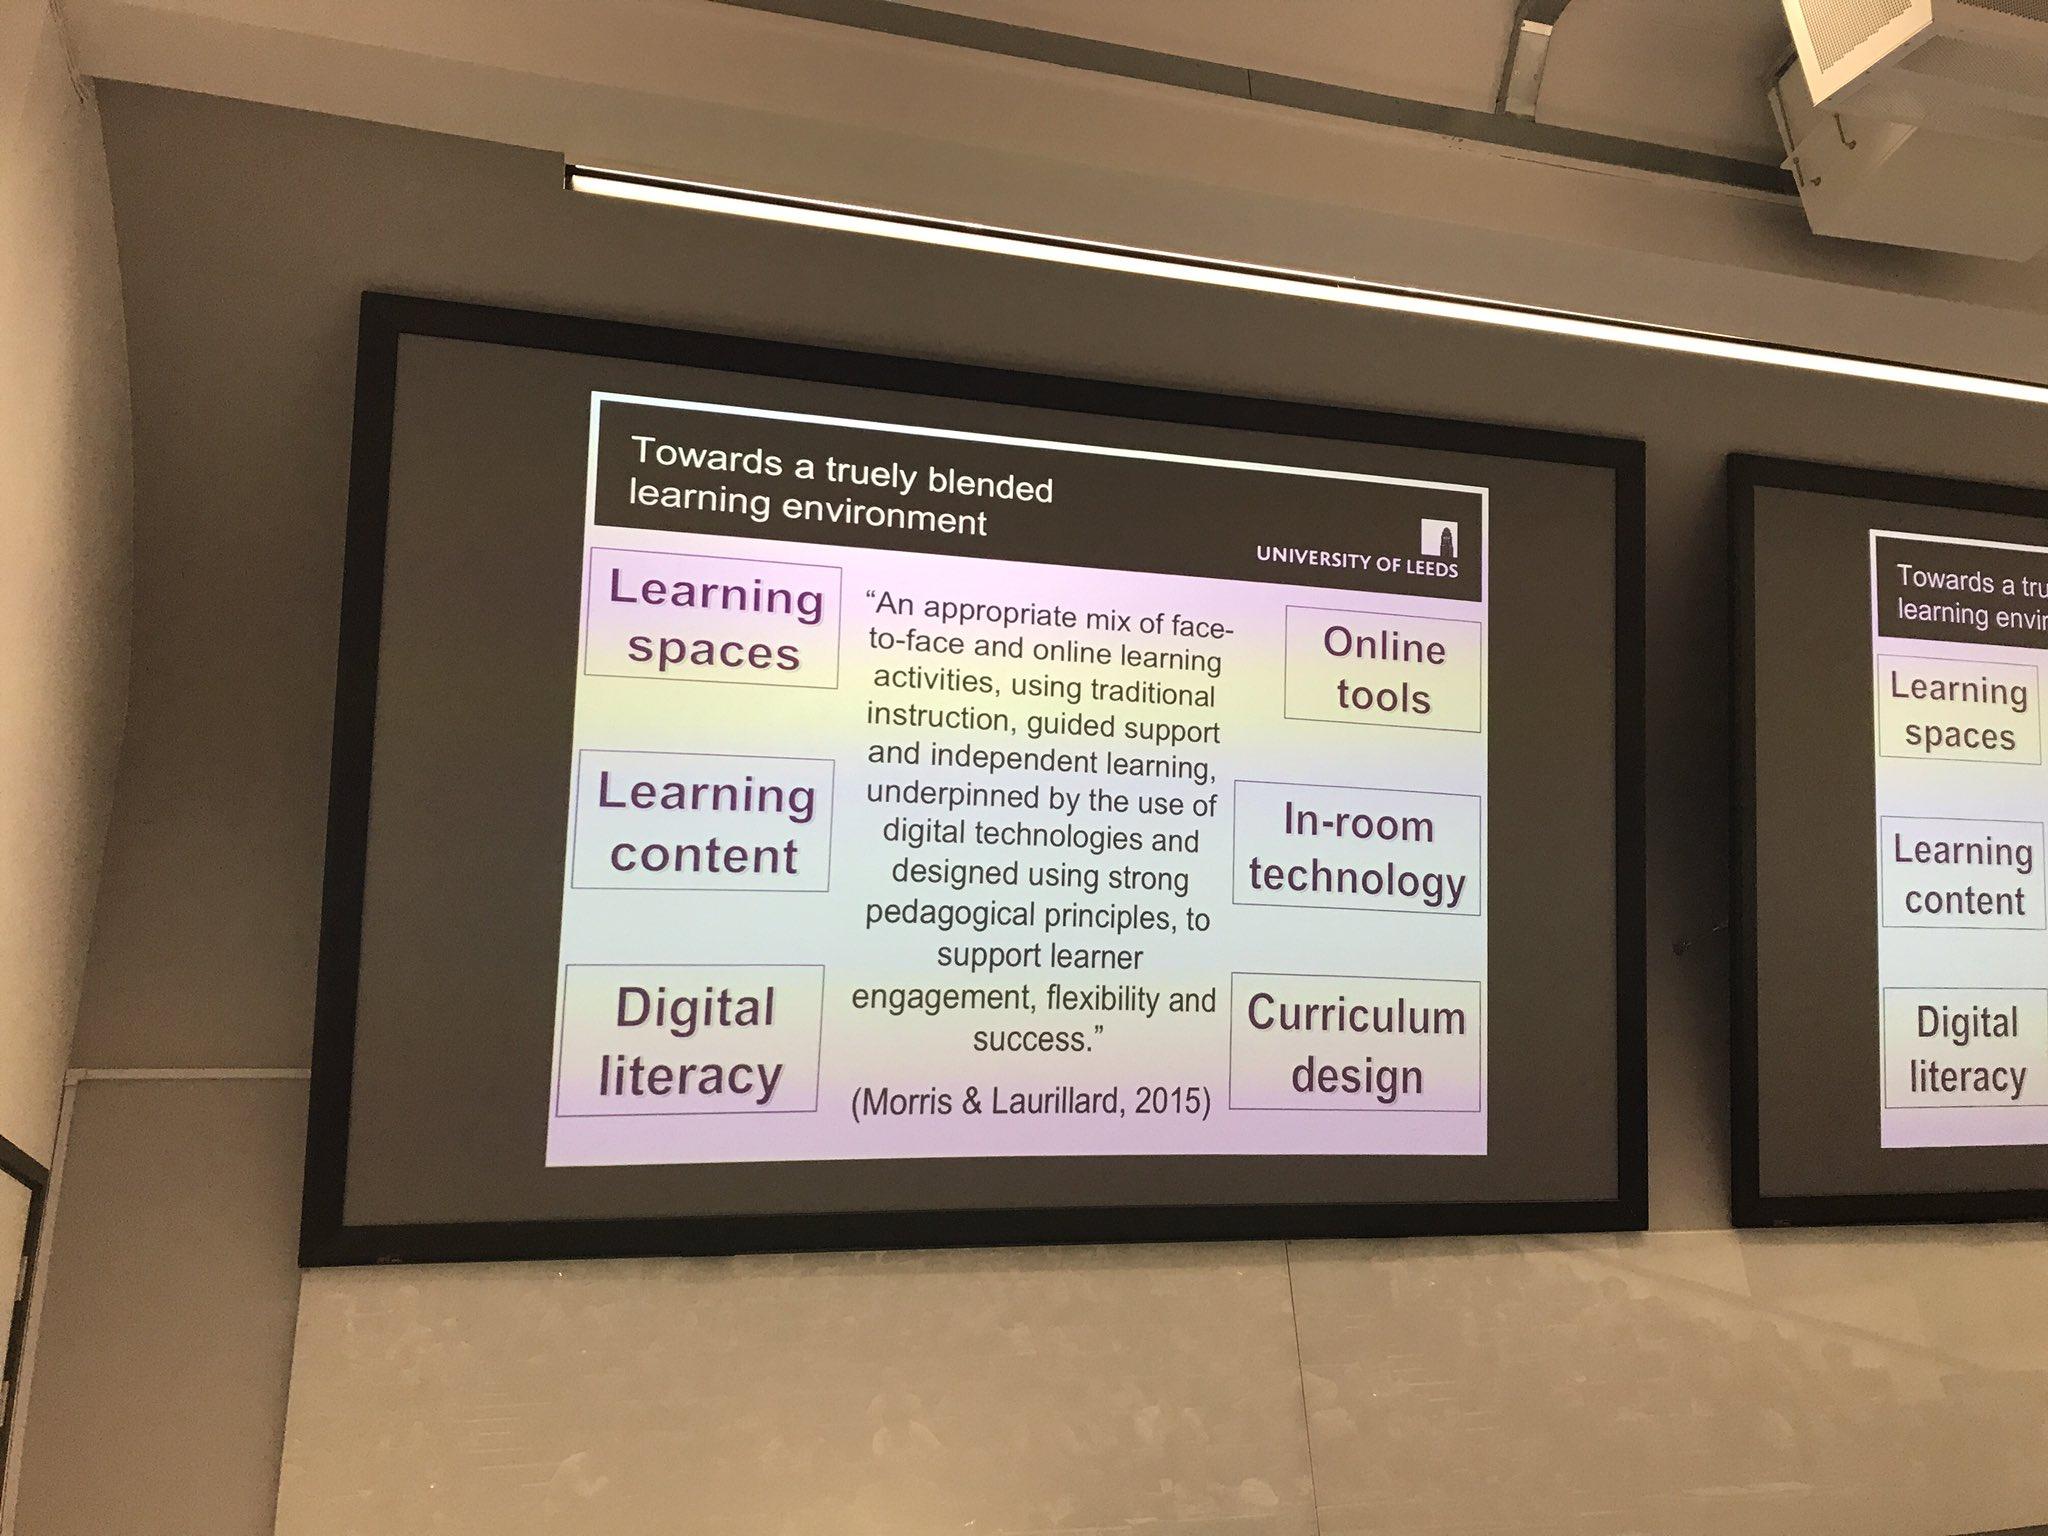 6 important things to consider if moving toward true blended learning @NeilMorrisLeeds #CUCEI17 https://t.co/KF7Ep4YSbz